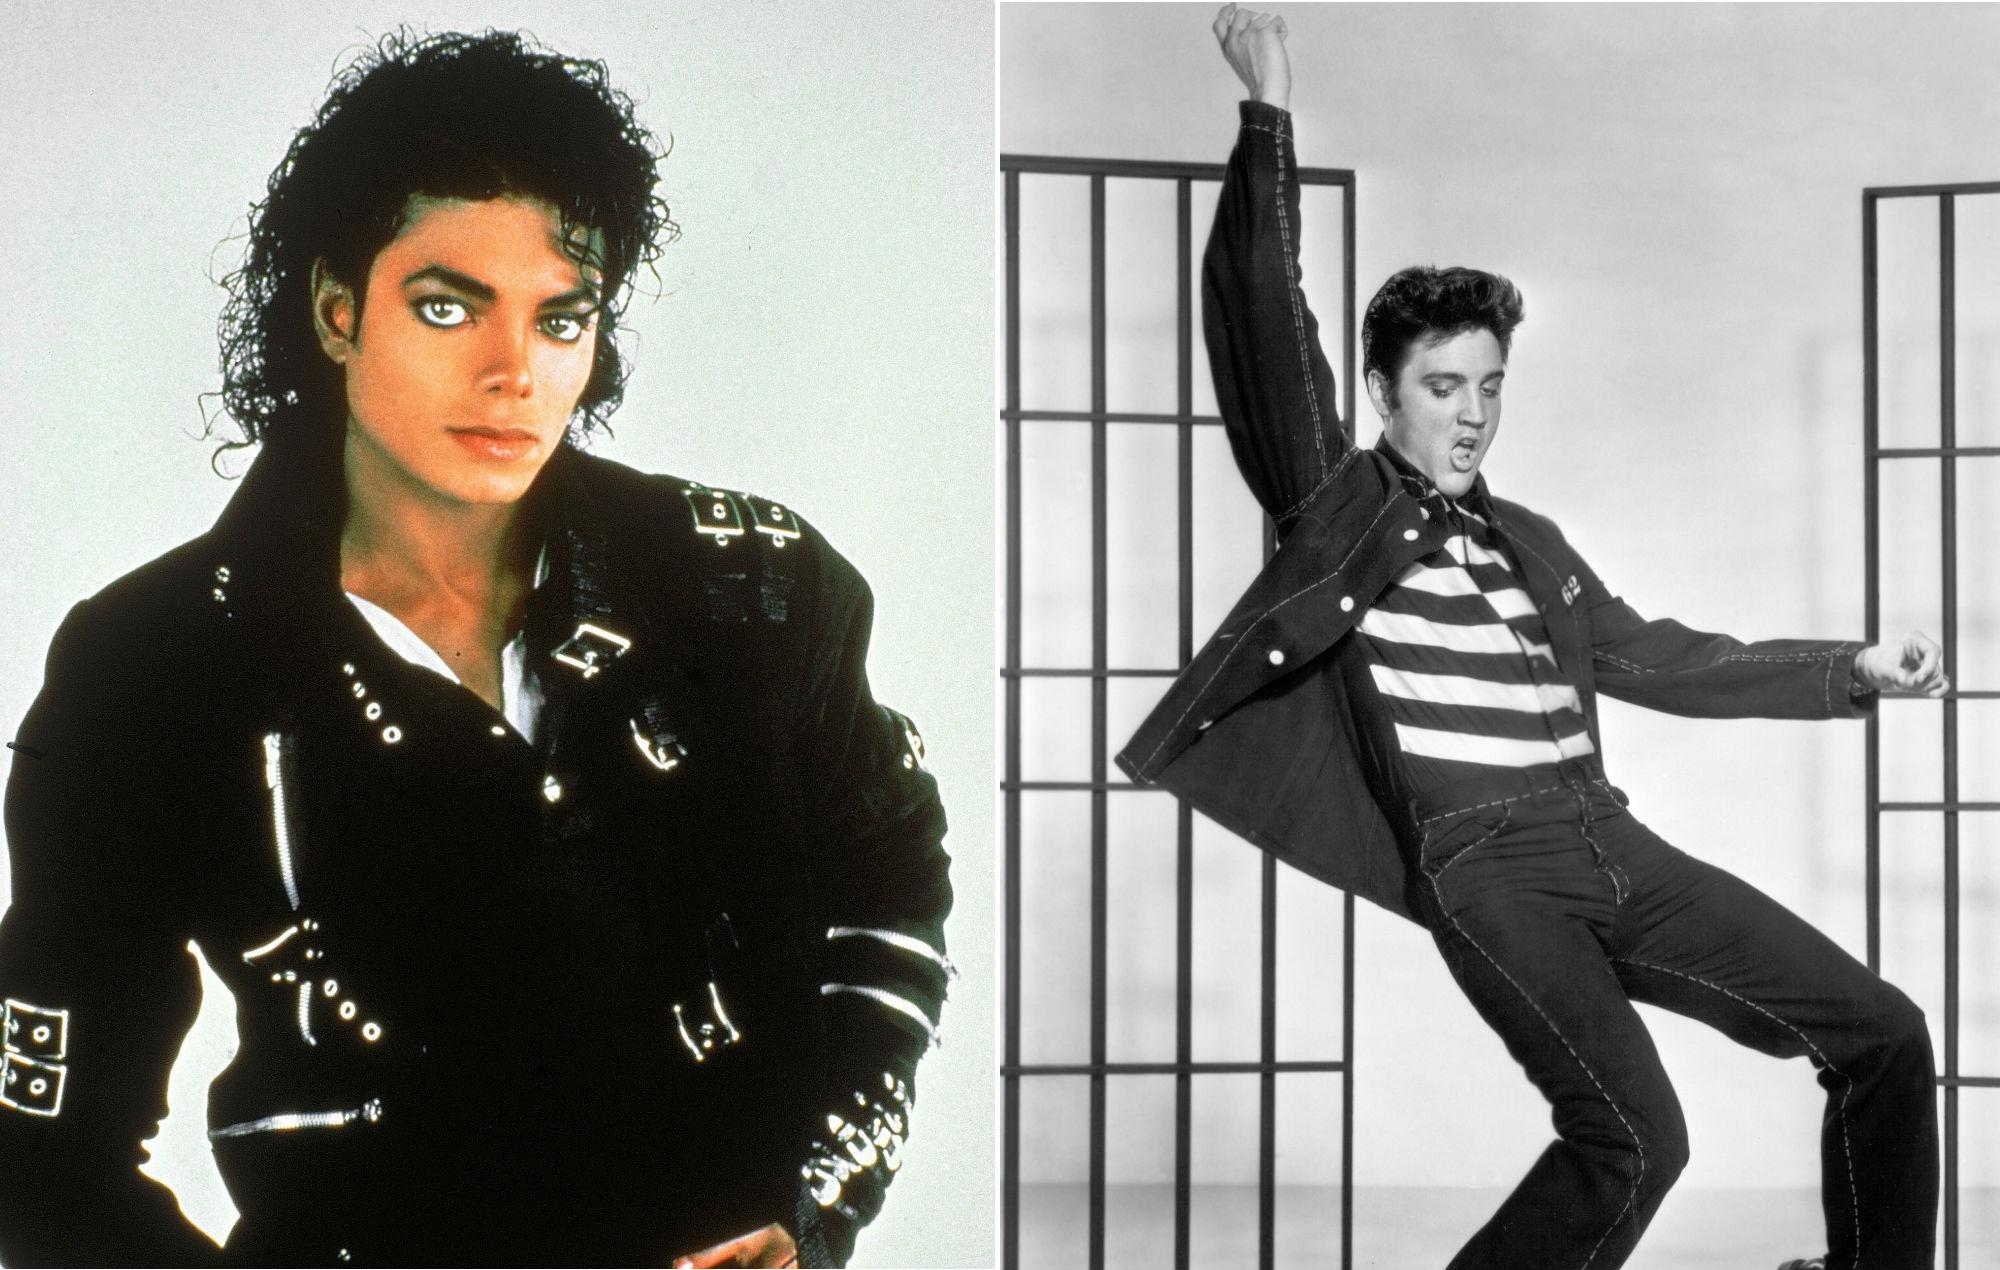 Michael Jackson And Elvis Presley Rule The List Of Highest Earning Dead Celebrities